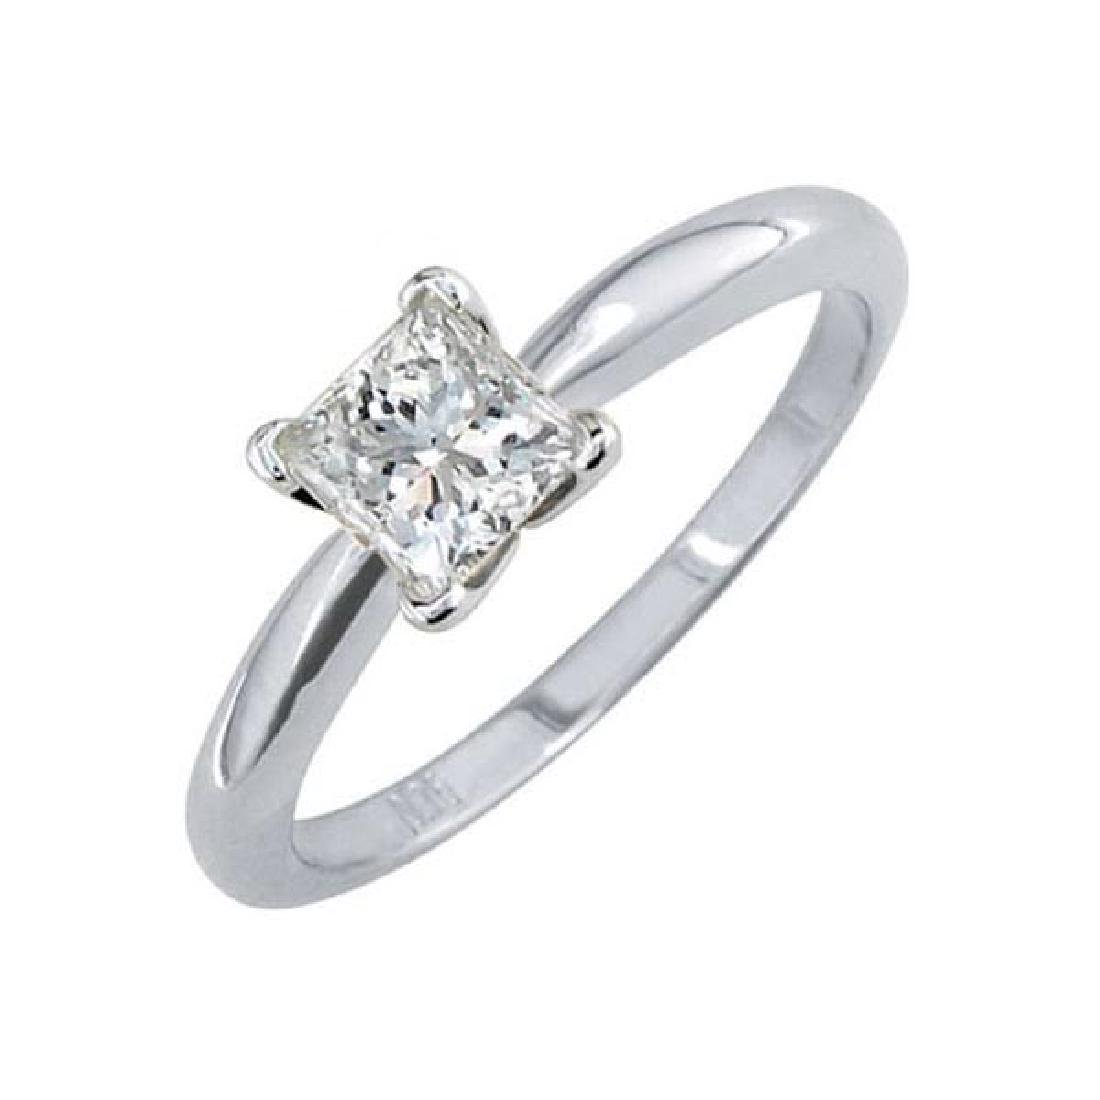 Certified 0.97 CTW Princess Diamond Solitaire 14k Ring